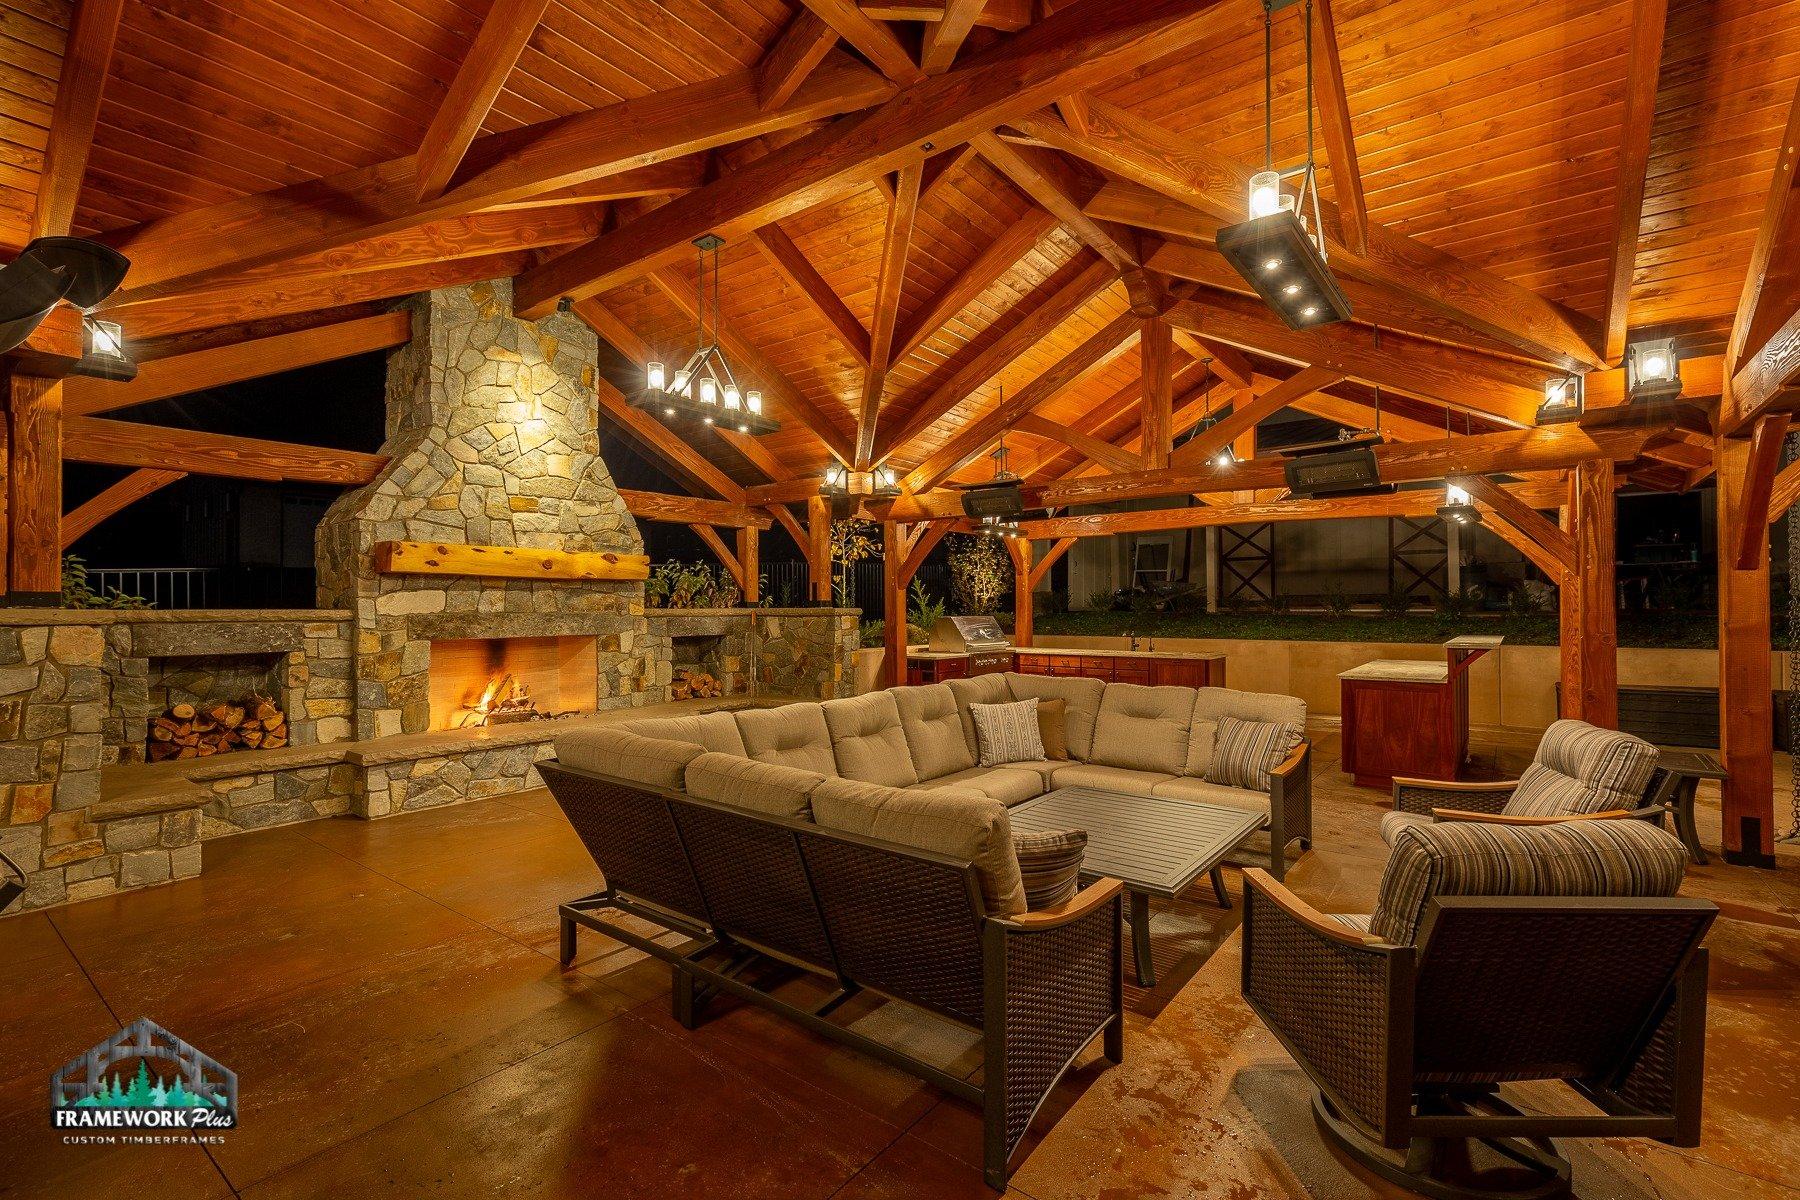 Timber Frame Pavilion Willamette Interior II